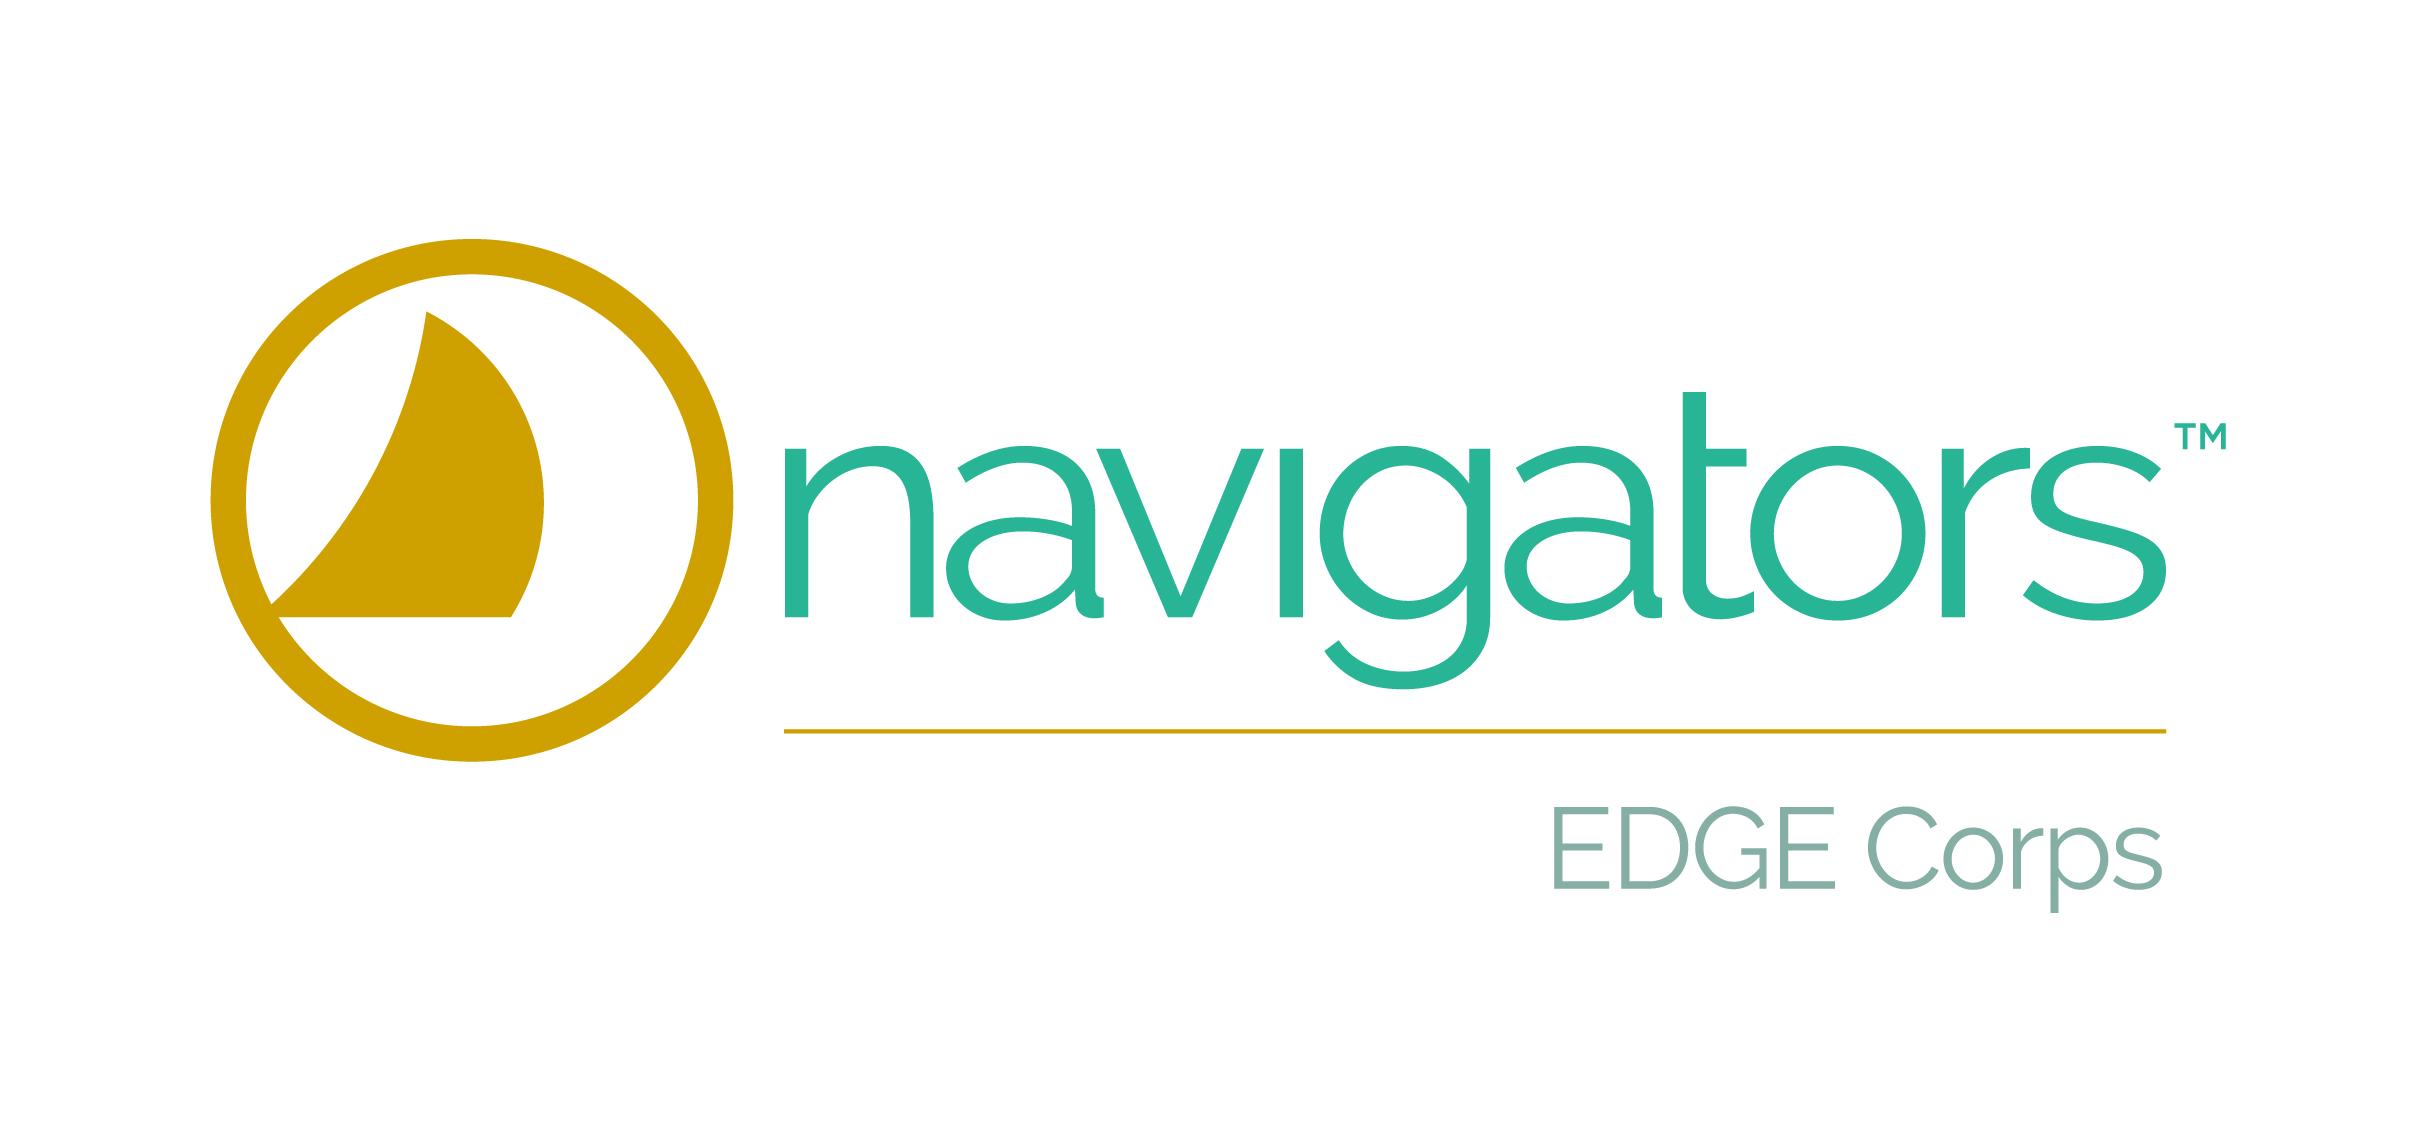 Navigators_EDGECorps_Color.jpg